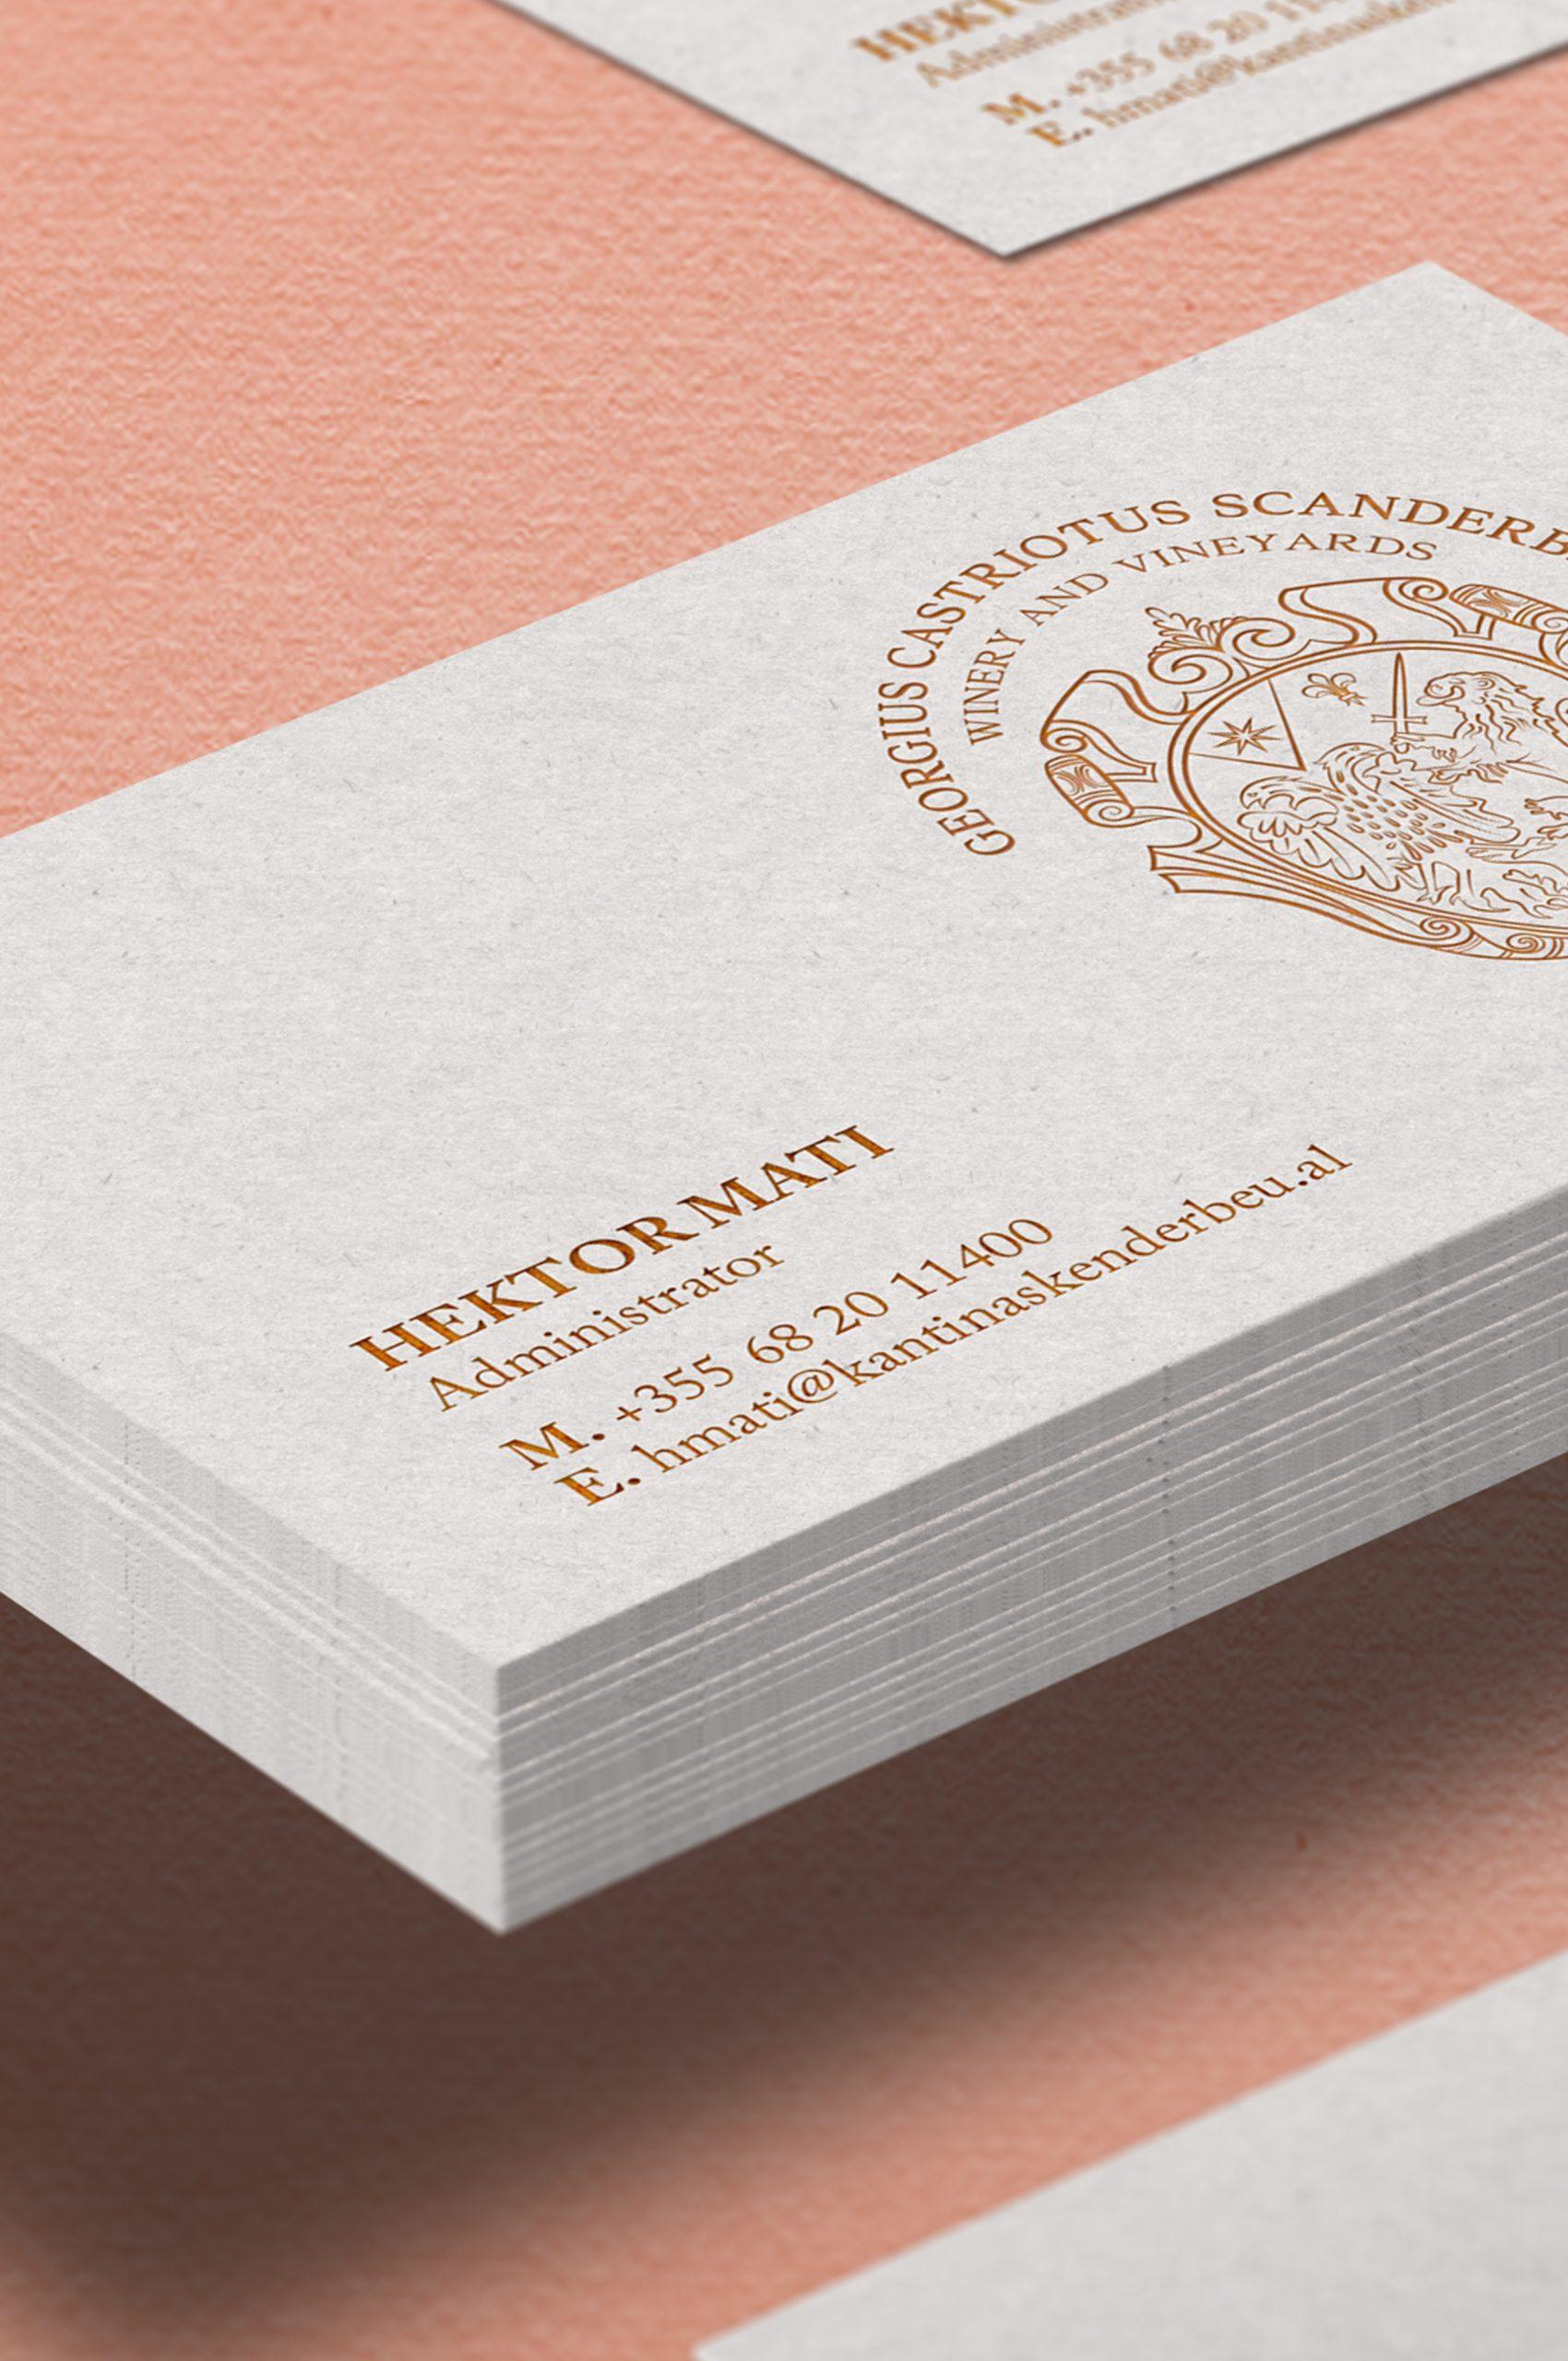 Kantina Skënderbeu, Wine, Project Img 23 - Vatra Agency / Founder & CEO Gerton Bejo